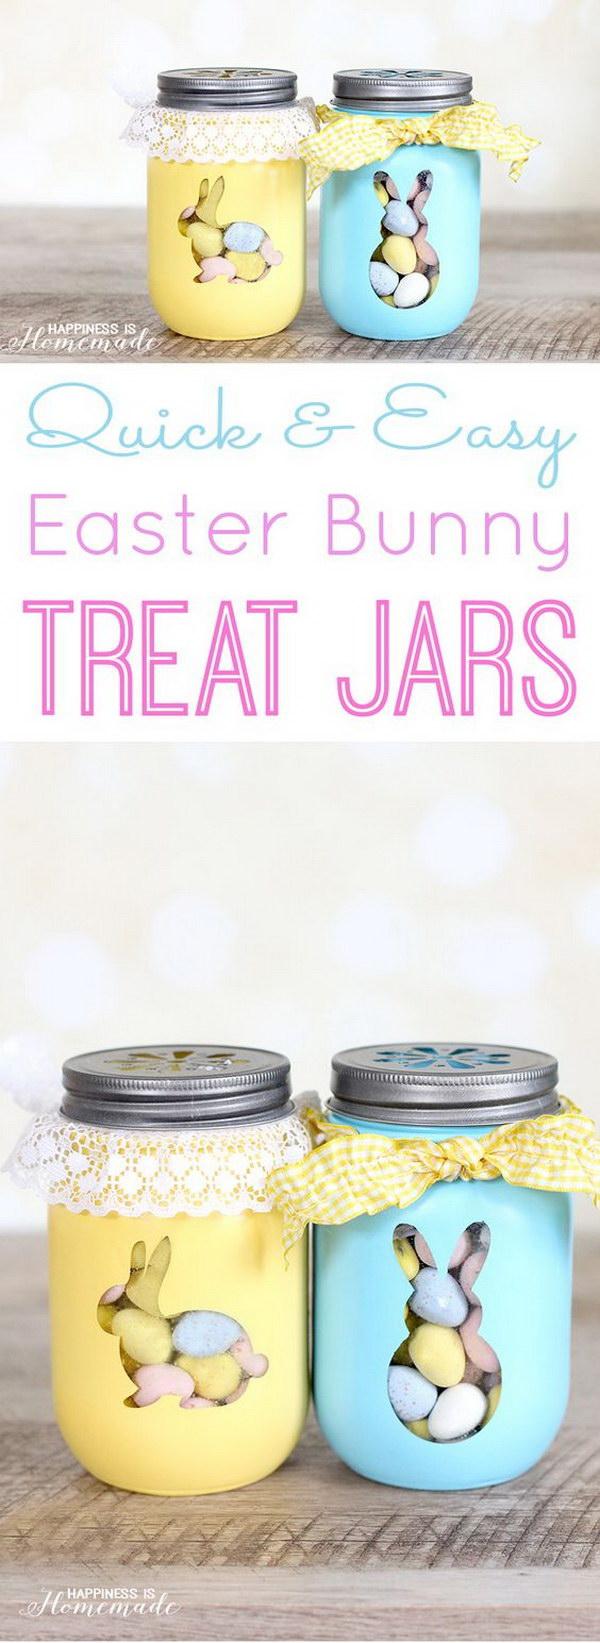 Easter Bunny Treat Jars.